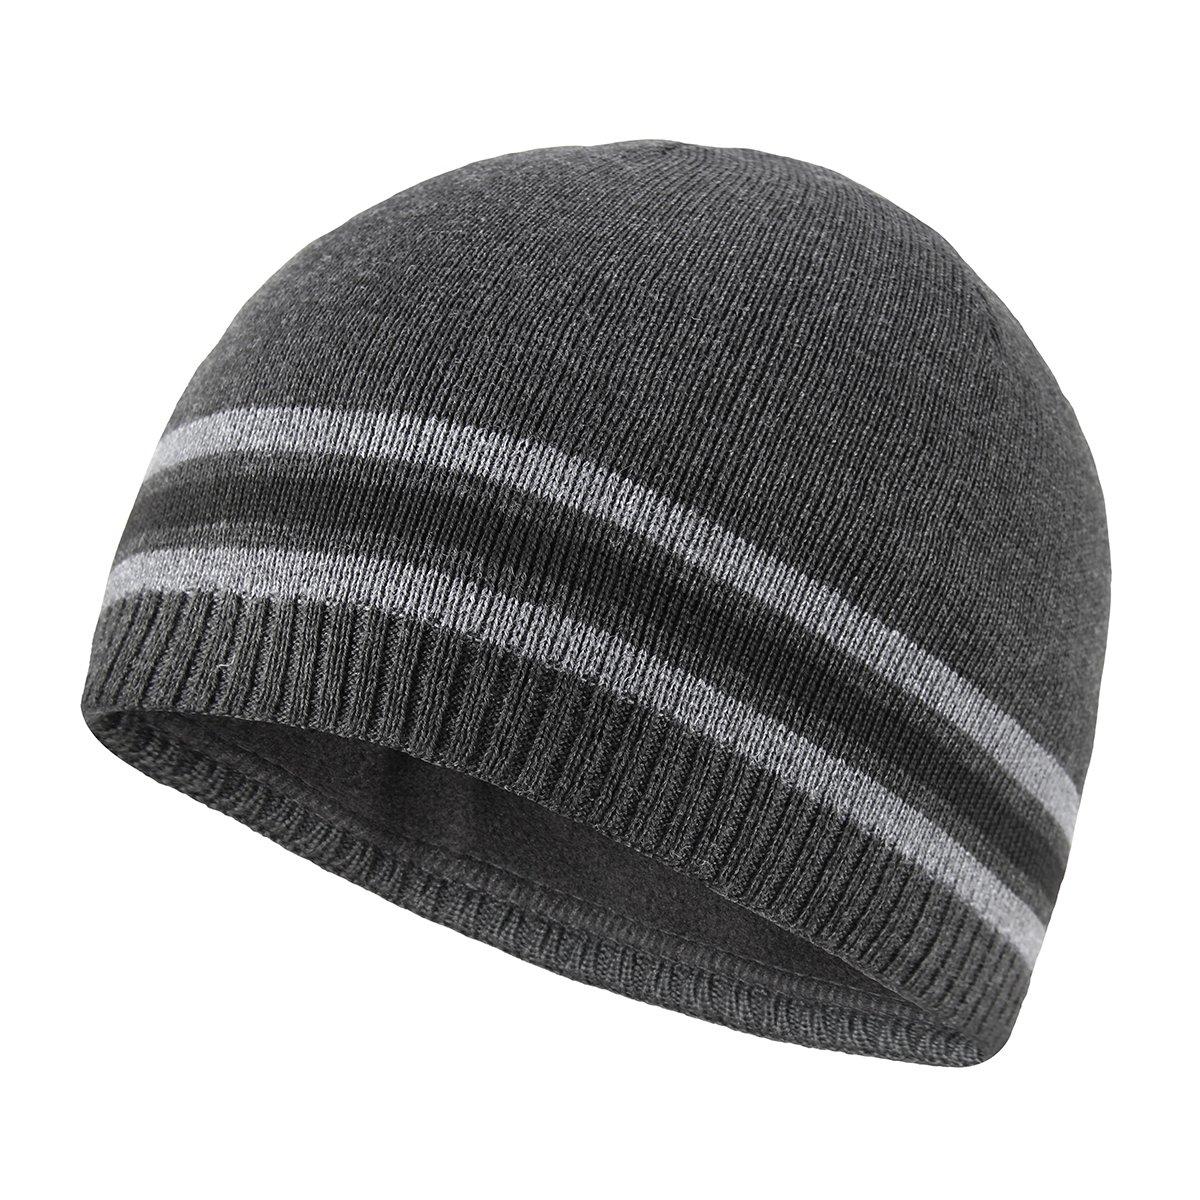 7de8dc2e71d OMECHY Mens Winter Beanie Hat Warm Cuff Toboggan Knit Ski Skull Cap ...